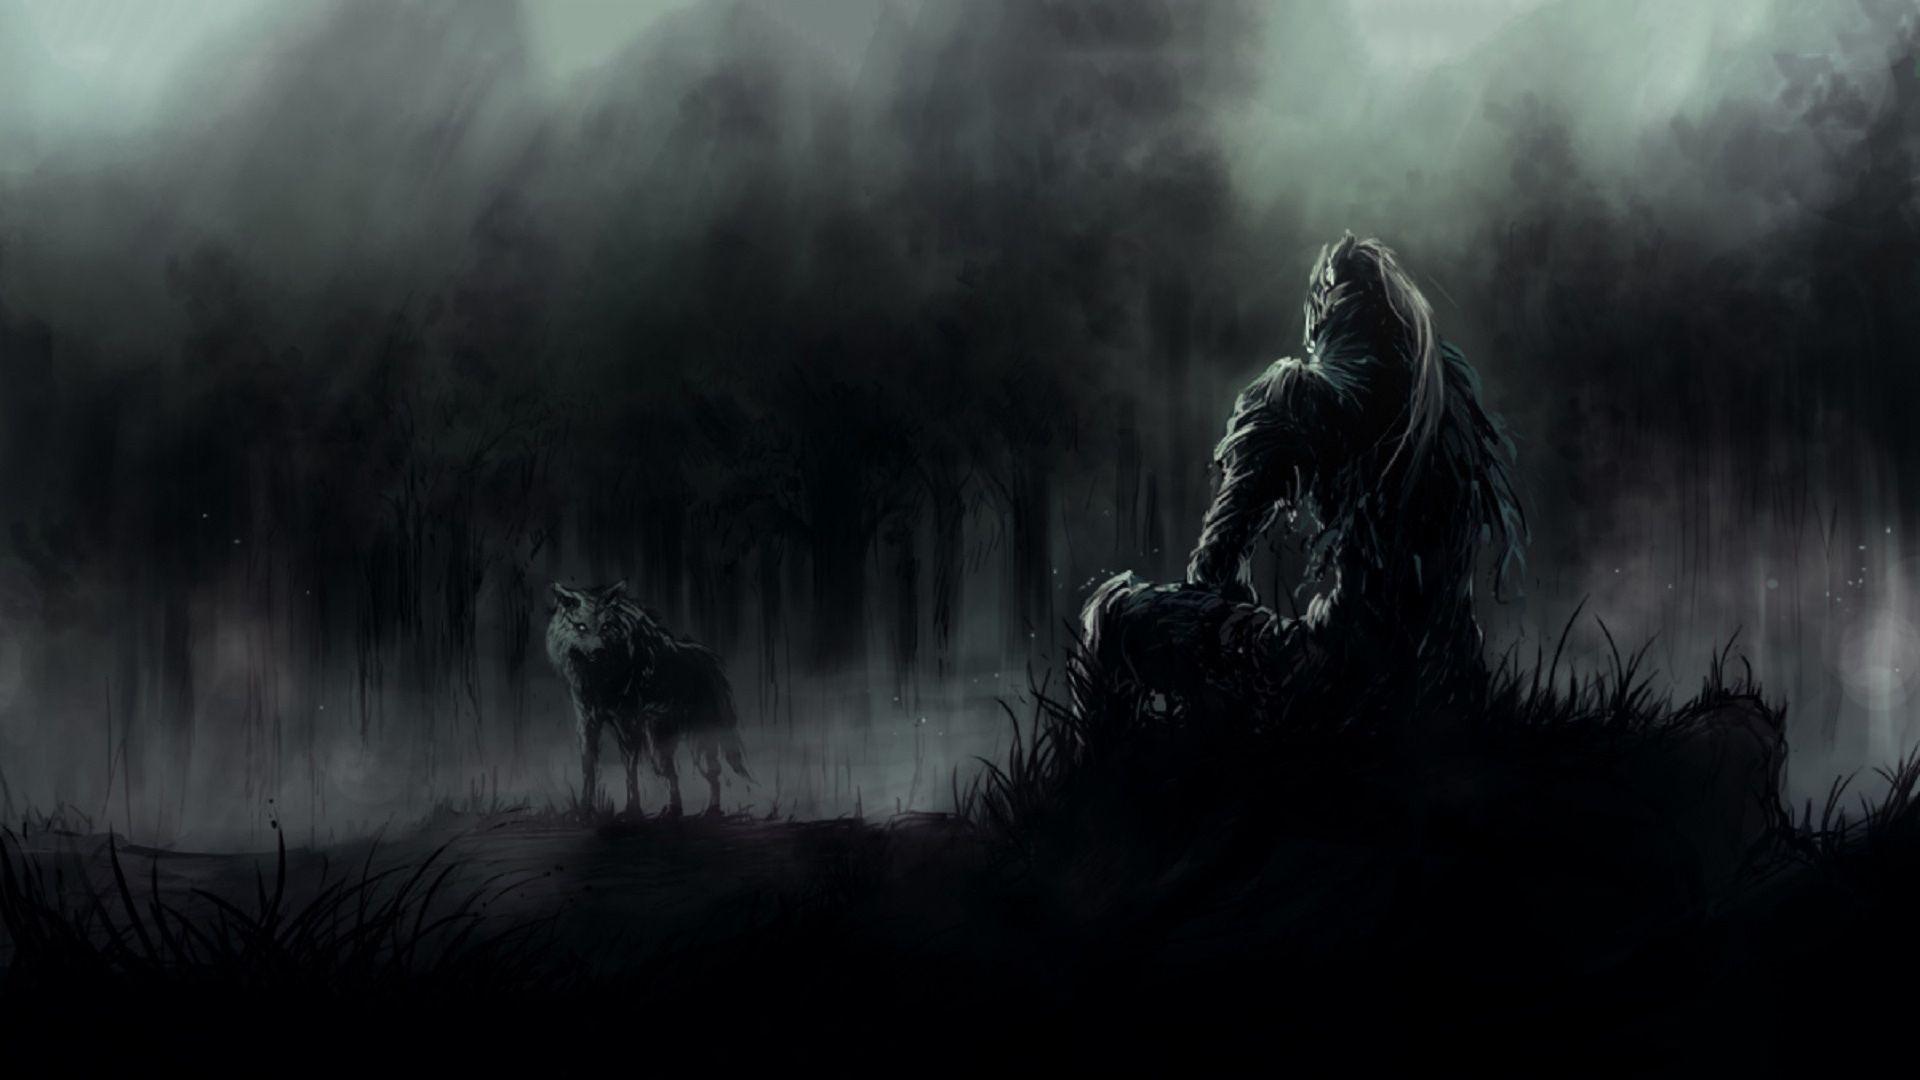 Dark Souls Wallpapers 1080p Jllsly Dark Souls Narcissist Breakup